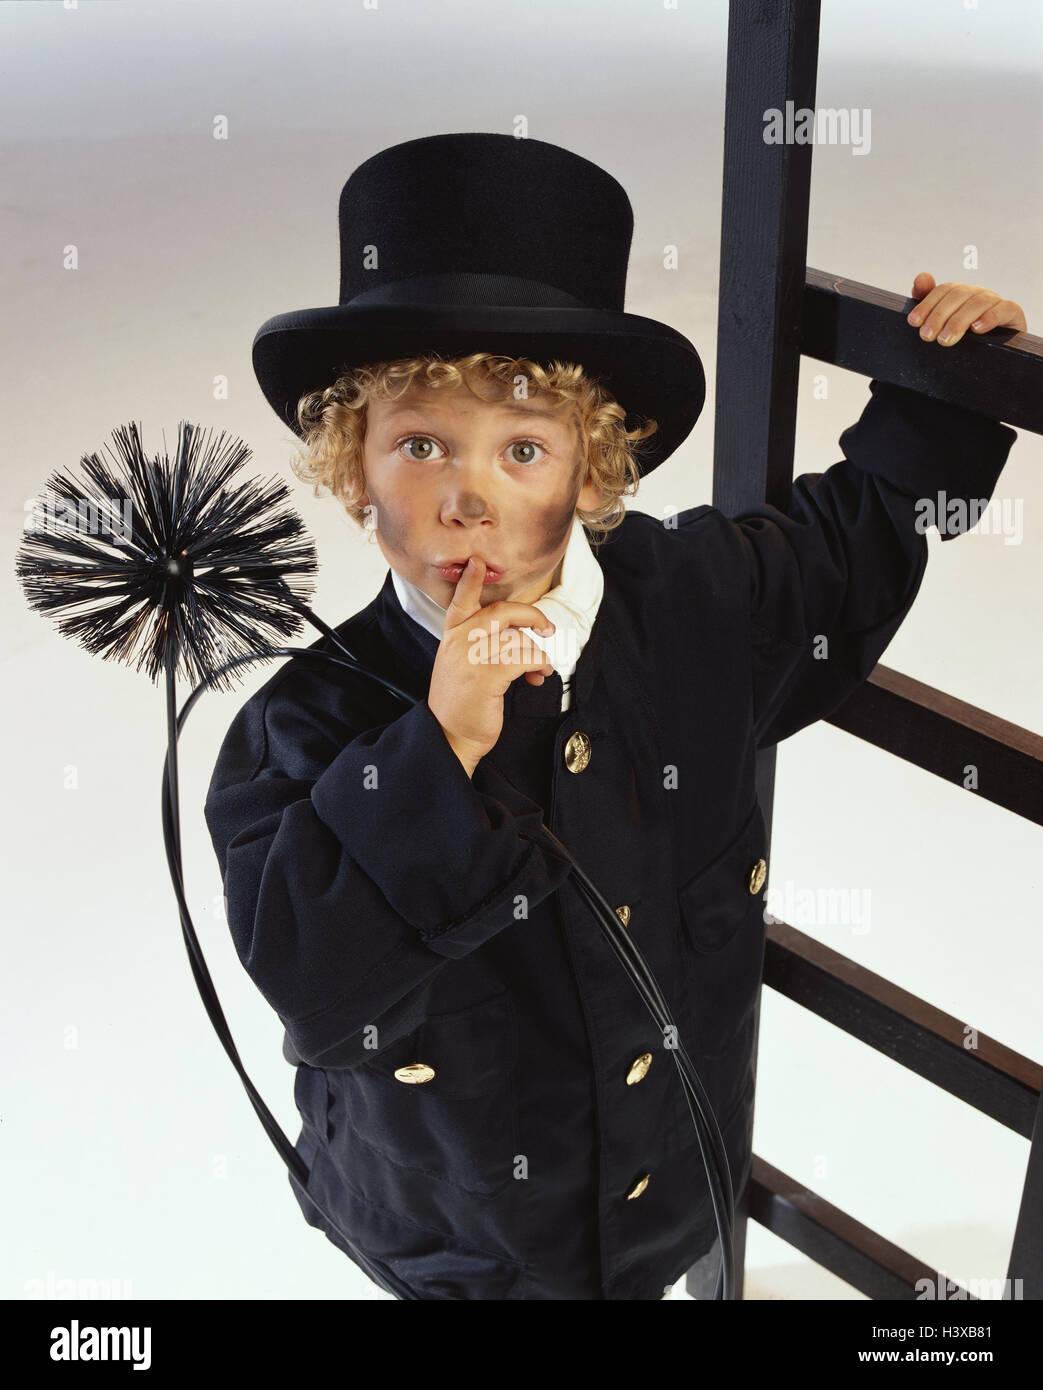 Policeman Chauffeur Chimney Sweep Uniform Victorian Gentleman